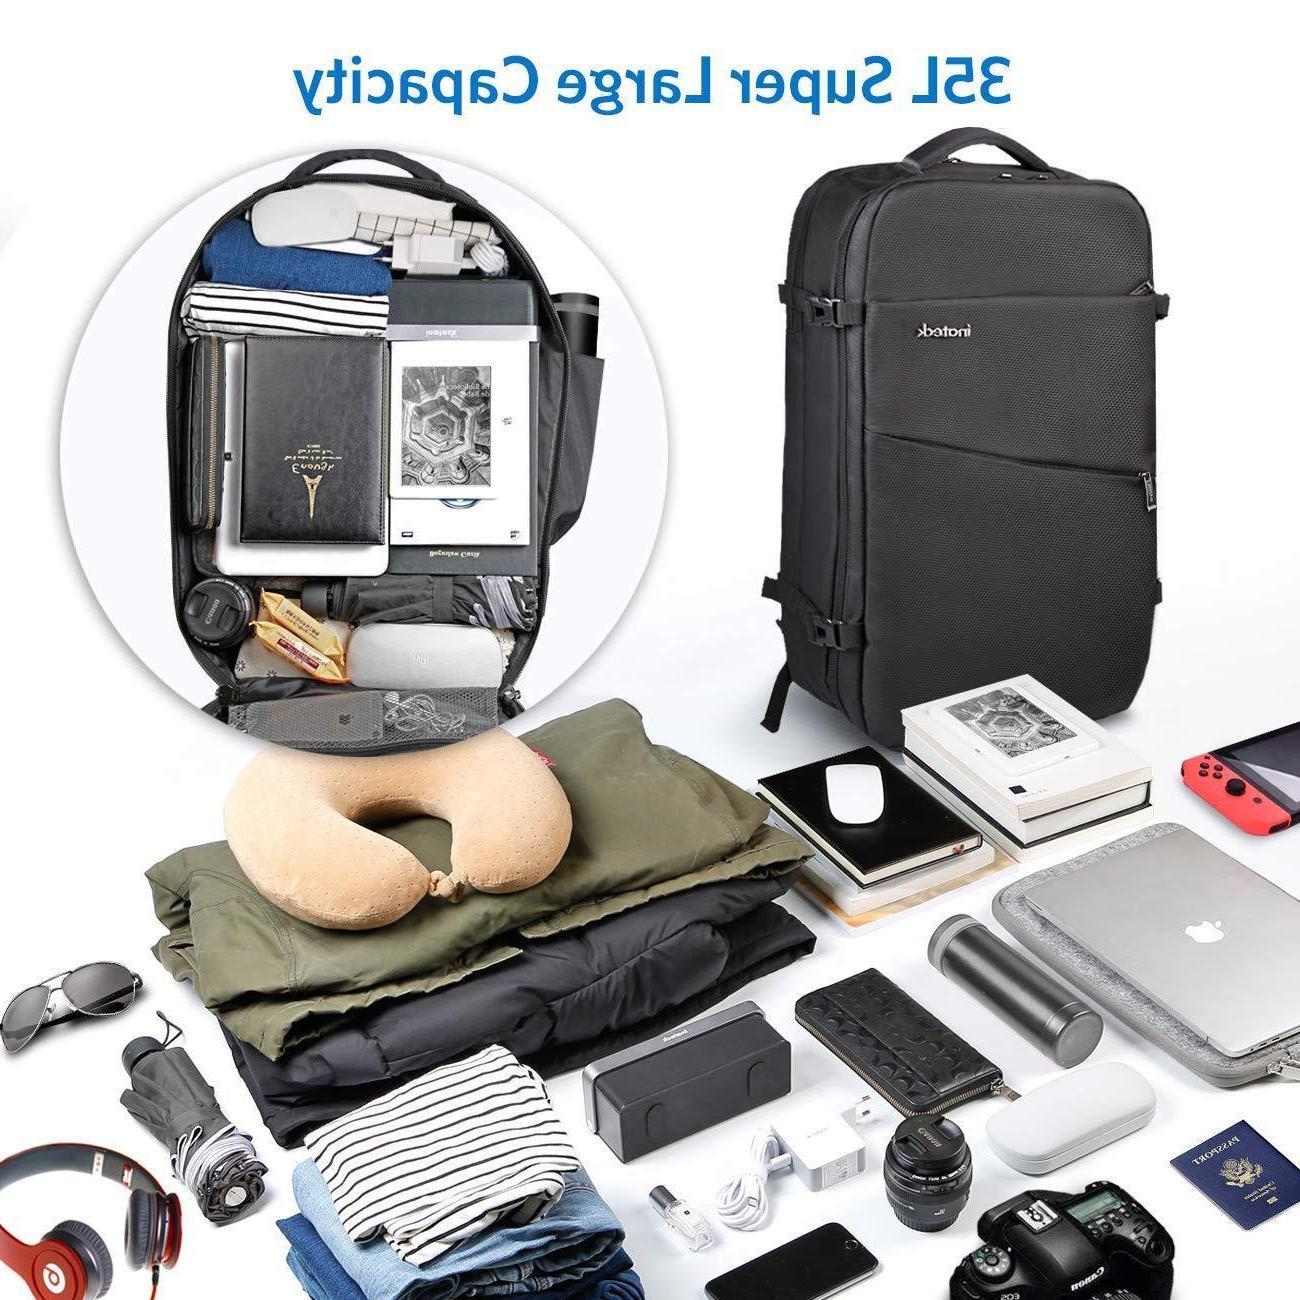 Inateck Travel Backpack, Rucksack - Black